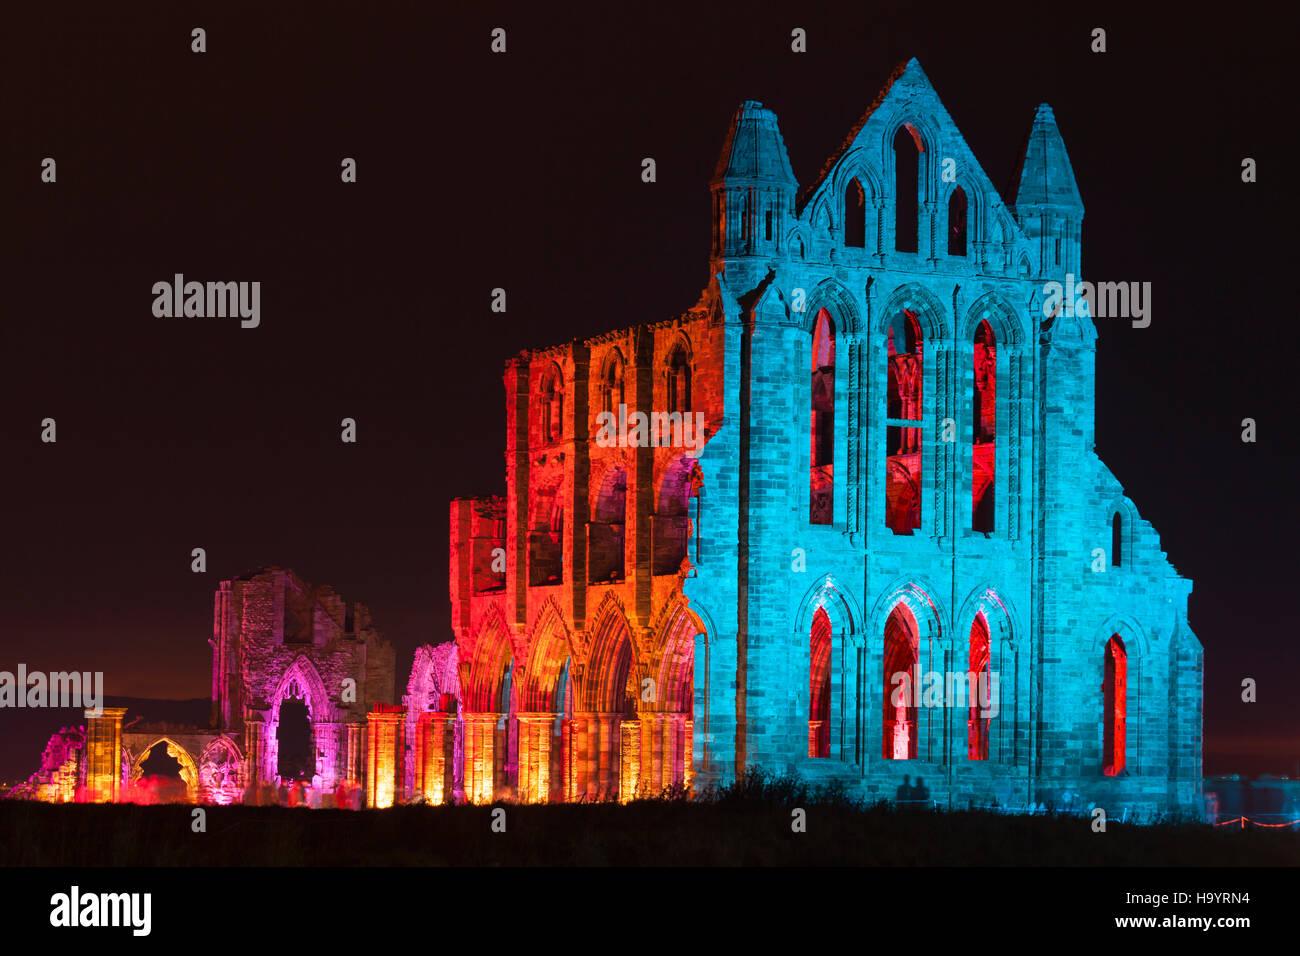 Encendida en Whitby Abbey Imagen De Stock